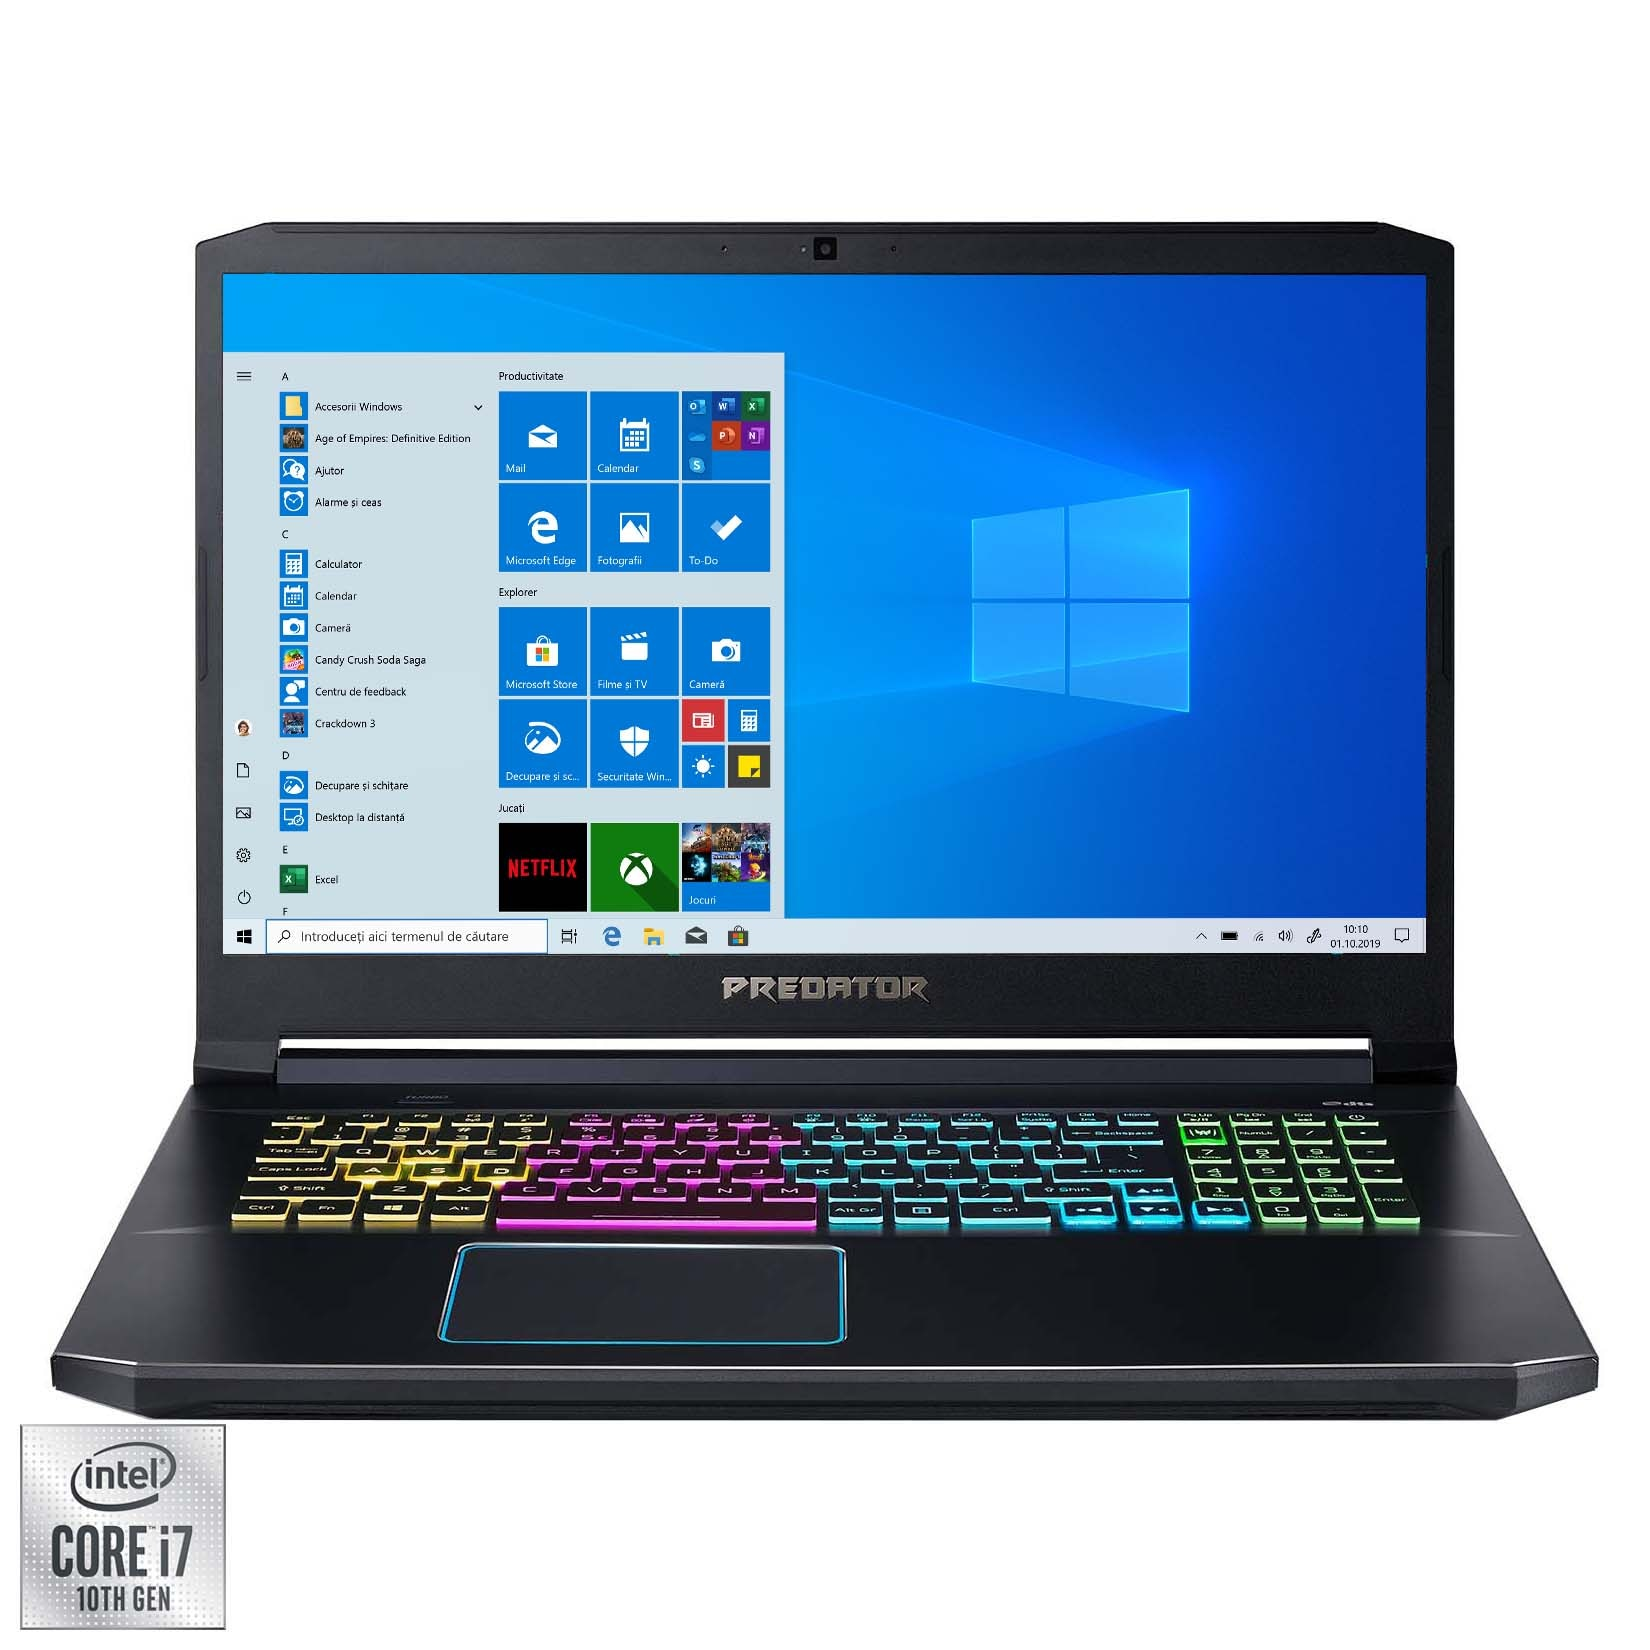 "Fotografie Laptop Gaming Acer Predator Helios 300 PH317-54 cu procesor Intel® Core™ i7-10750H pana la 5.00 GHz, 17.3"", Full HD, 144Hz, 16GB, 1TB SSD, NVIDIA® GeForce RTX™ 2060 6GB, Windows 10 Home, Black"